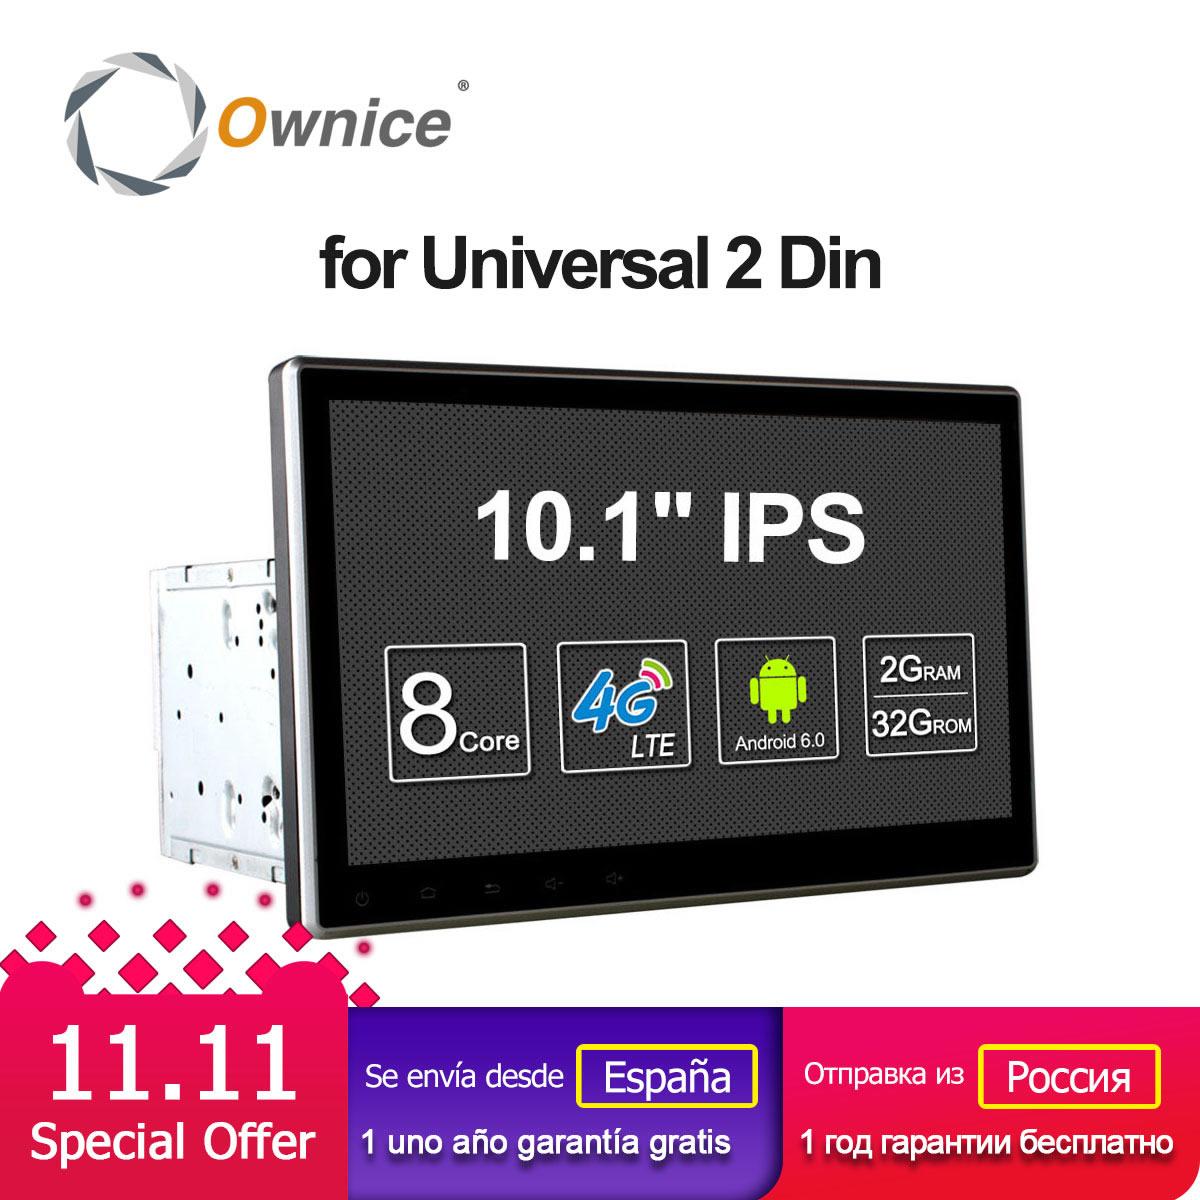 Ownice C500 2Din 10.1 pollice HD android 6.0 octa core Universal car radio stereo Lettore DVD di Navigazione GPS TPMS DAB 4g LTE Carplay